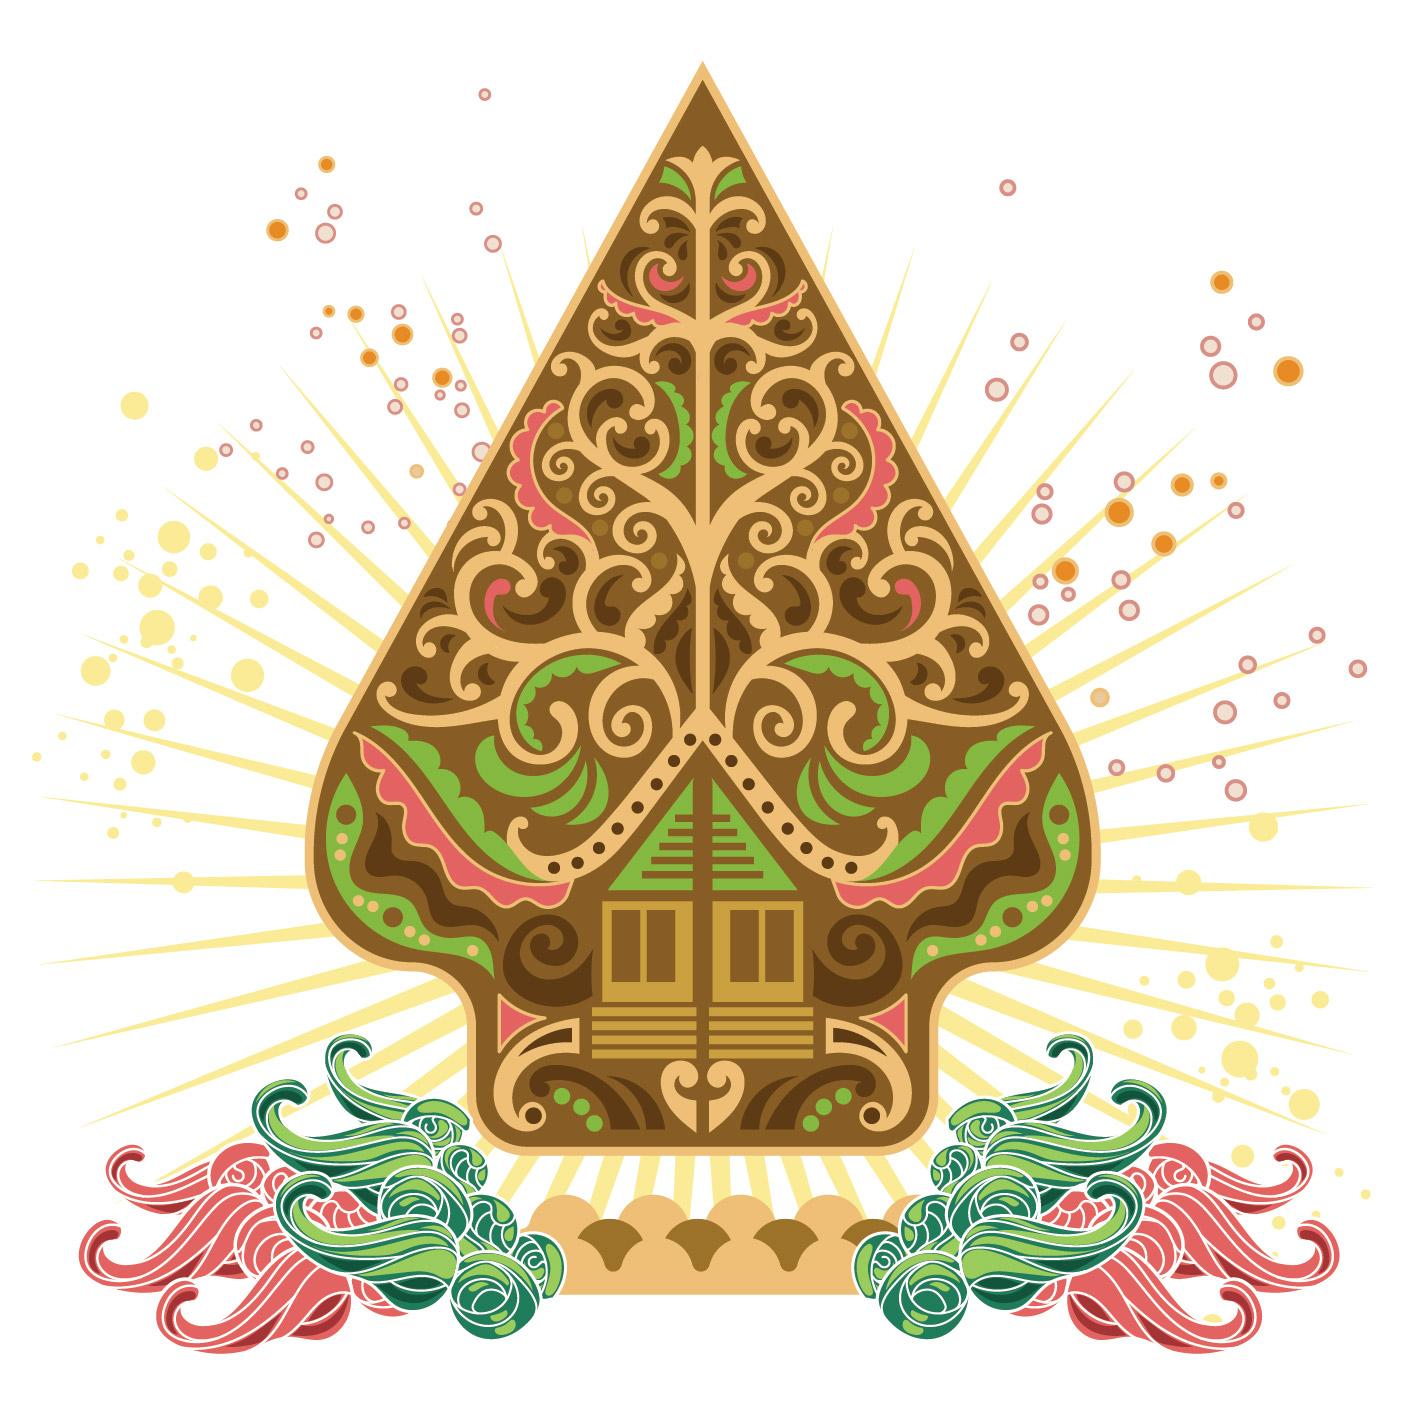 Flat Vector Pattern Of Wayang Gunungan Download Free Vector Art Stock Graphics Images